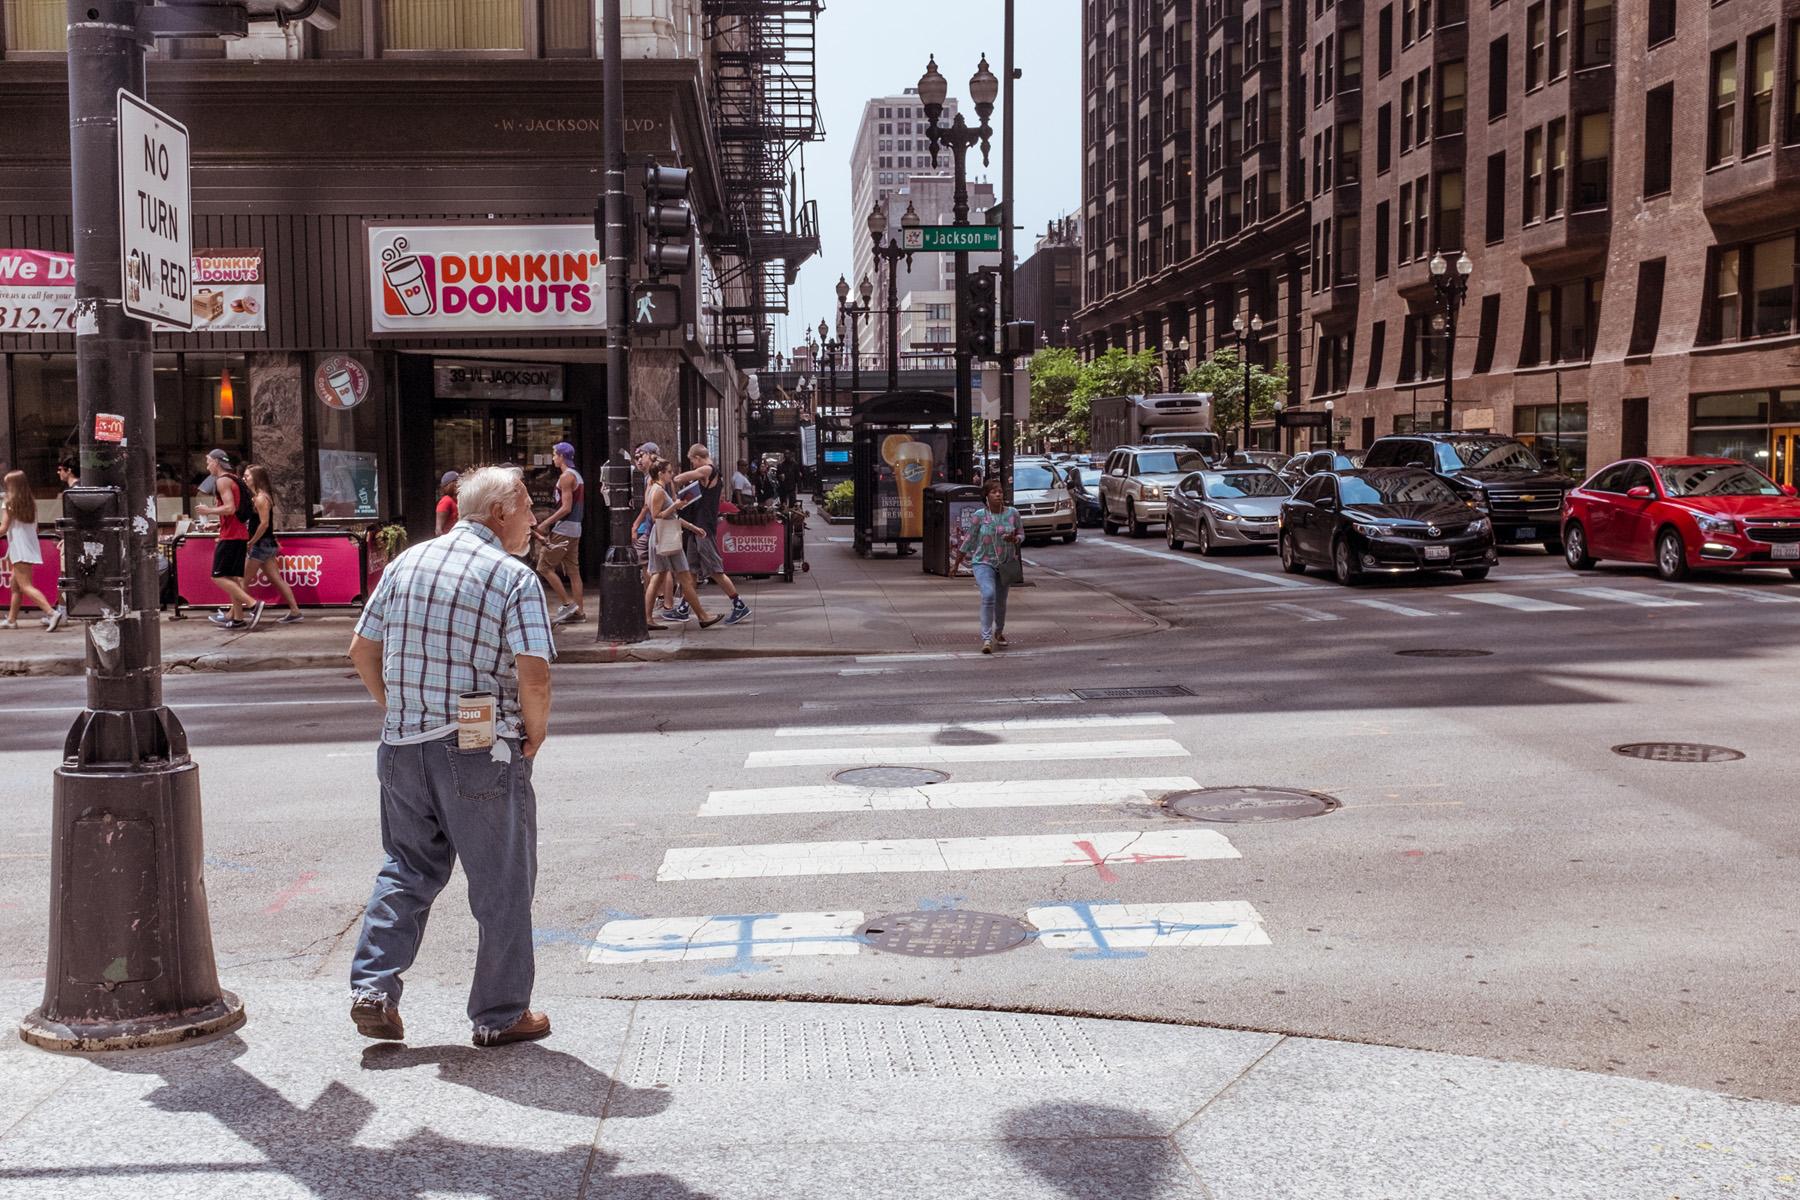 an older gentleman about to cross the street.